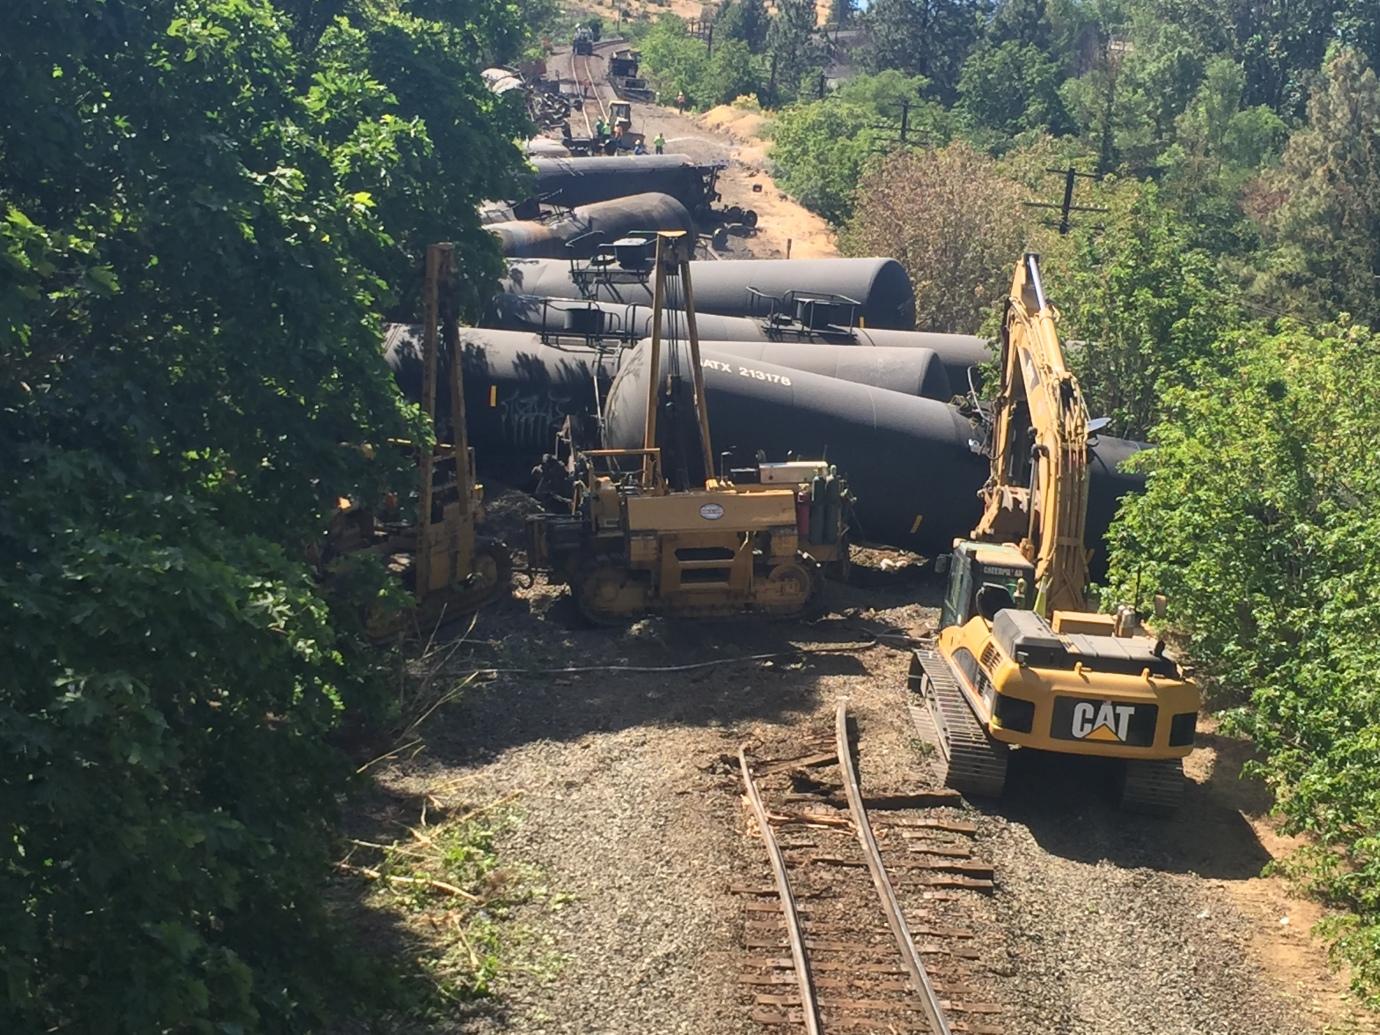 Train derailment Moser Oregon- WA Department of Ecology